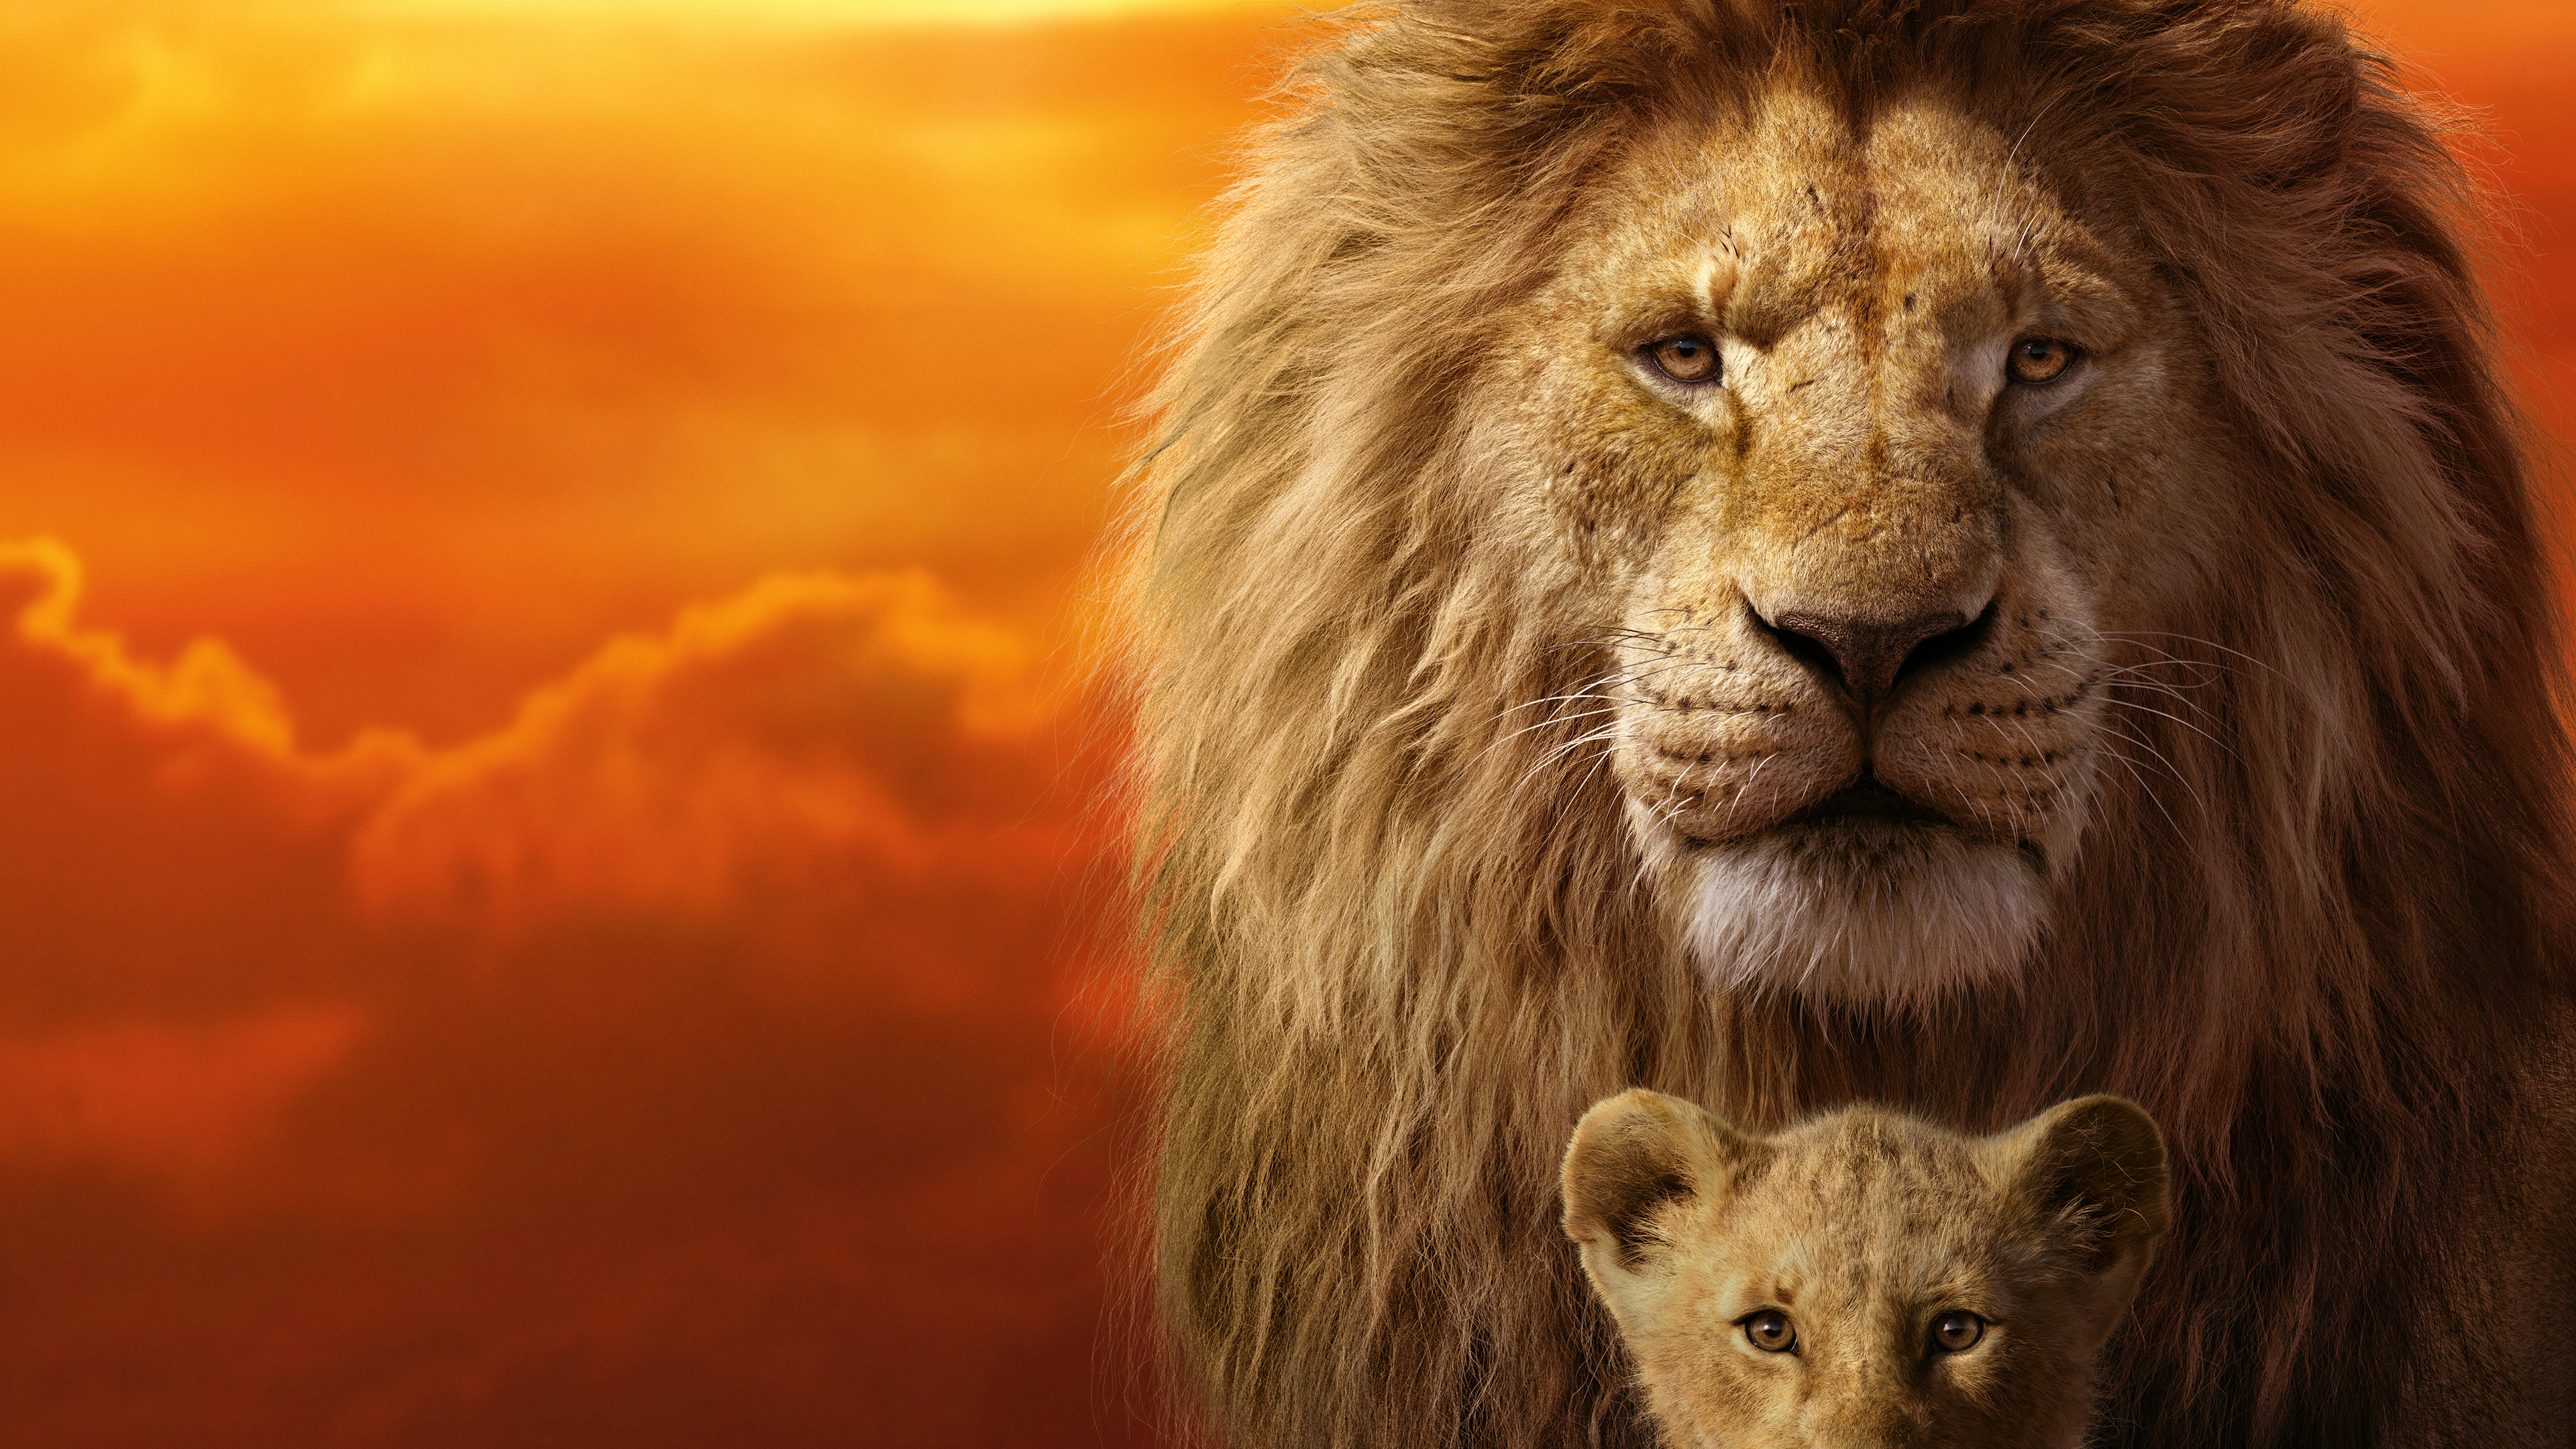 the lion king 1562107131 - The Lion King - the lion king wallpapers, simba wallpapers, movies wallpapers, lion wallpapers, hd-wallpapers, disney wallpapers, 8k wallpapers, 5k wallpapers, 4k-wallpapers, 2019 movies wallpapers